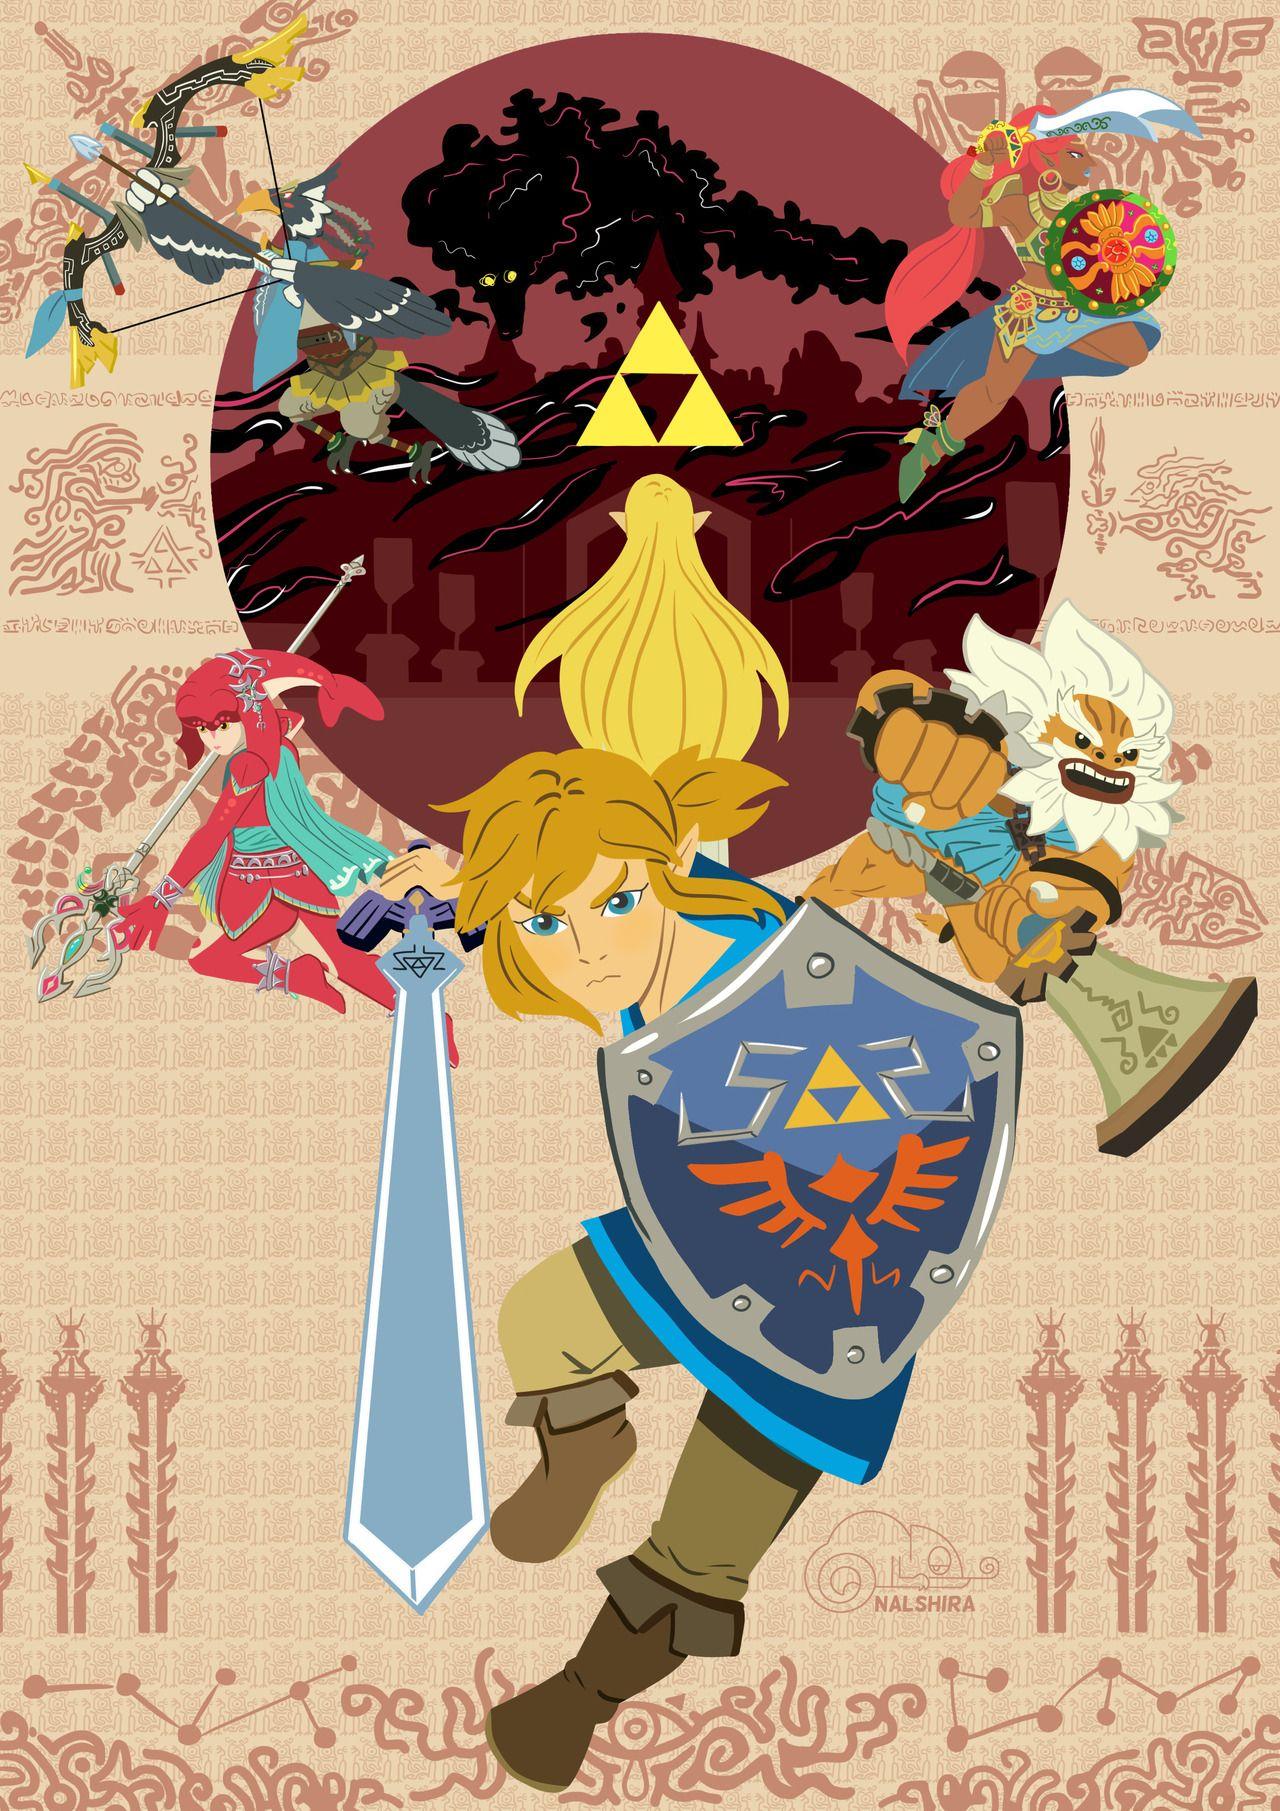 Legend Of Zelda Breath Of The Wild Art By Nalshira Draws Link Princess Zelda The Champions Reva Legend Of Zelda Breath Of The Wild Legend Of Zelda Breath